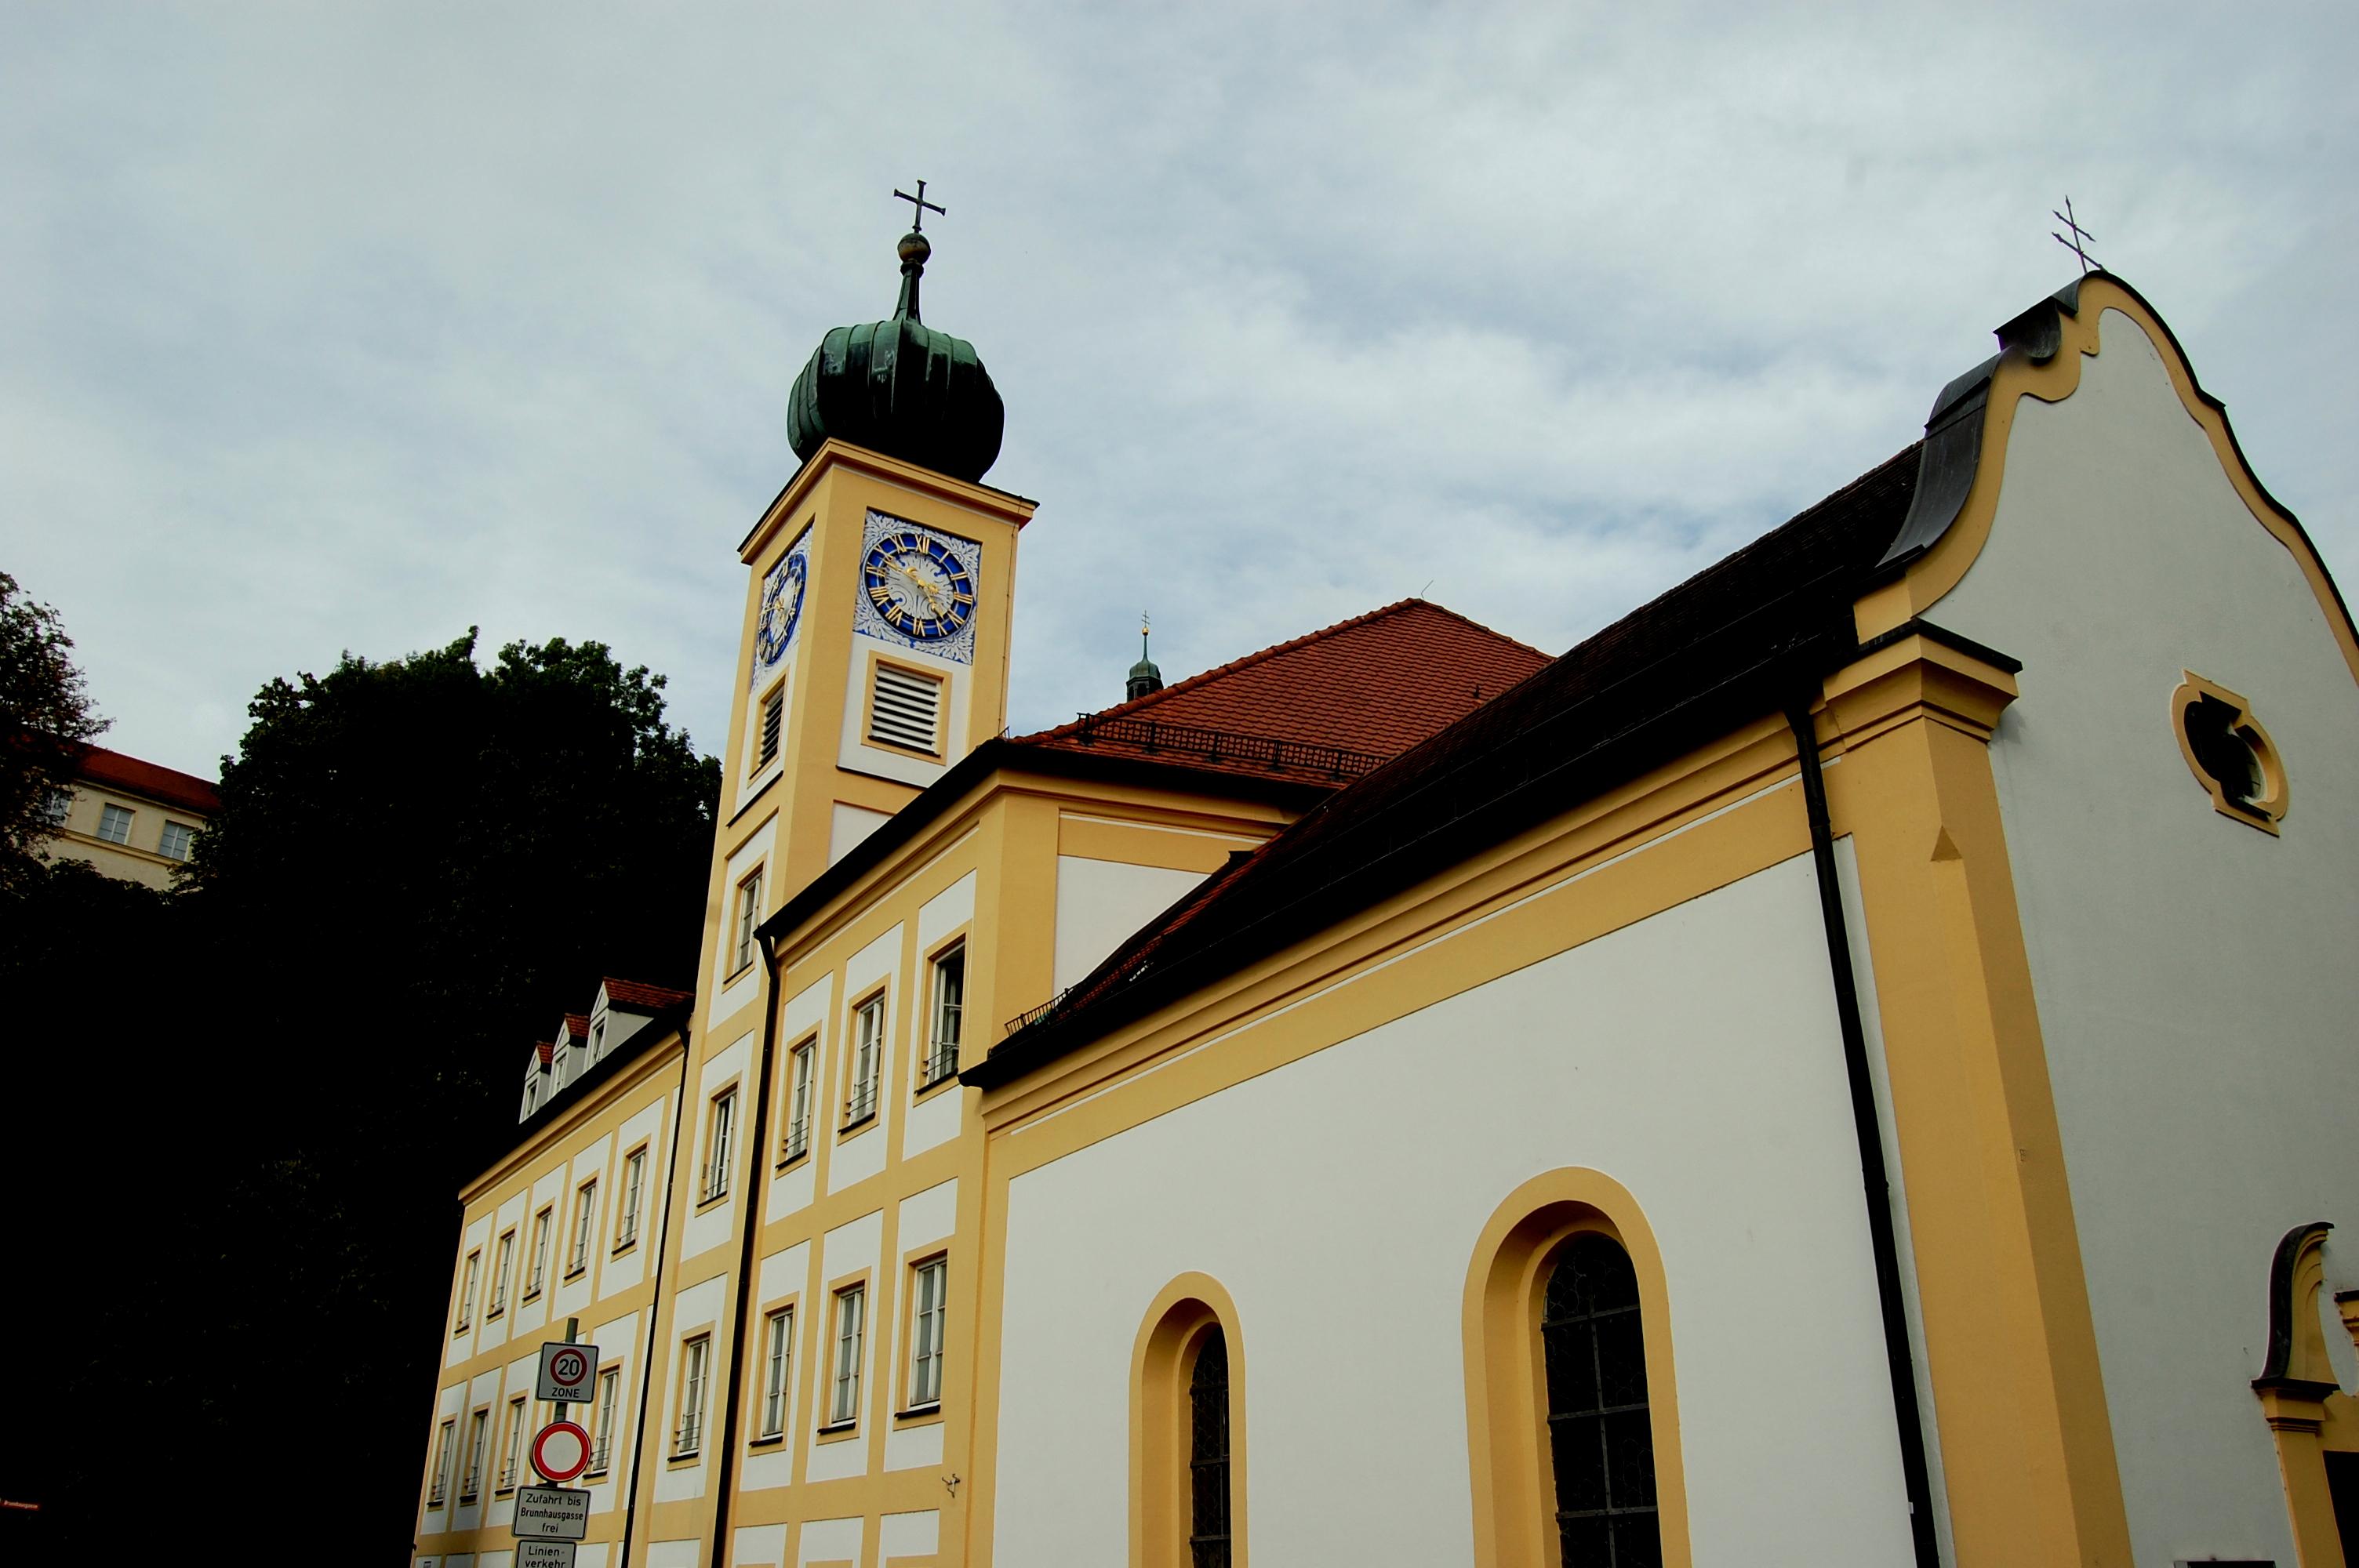 Freising day trip